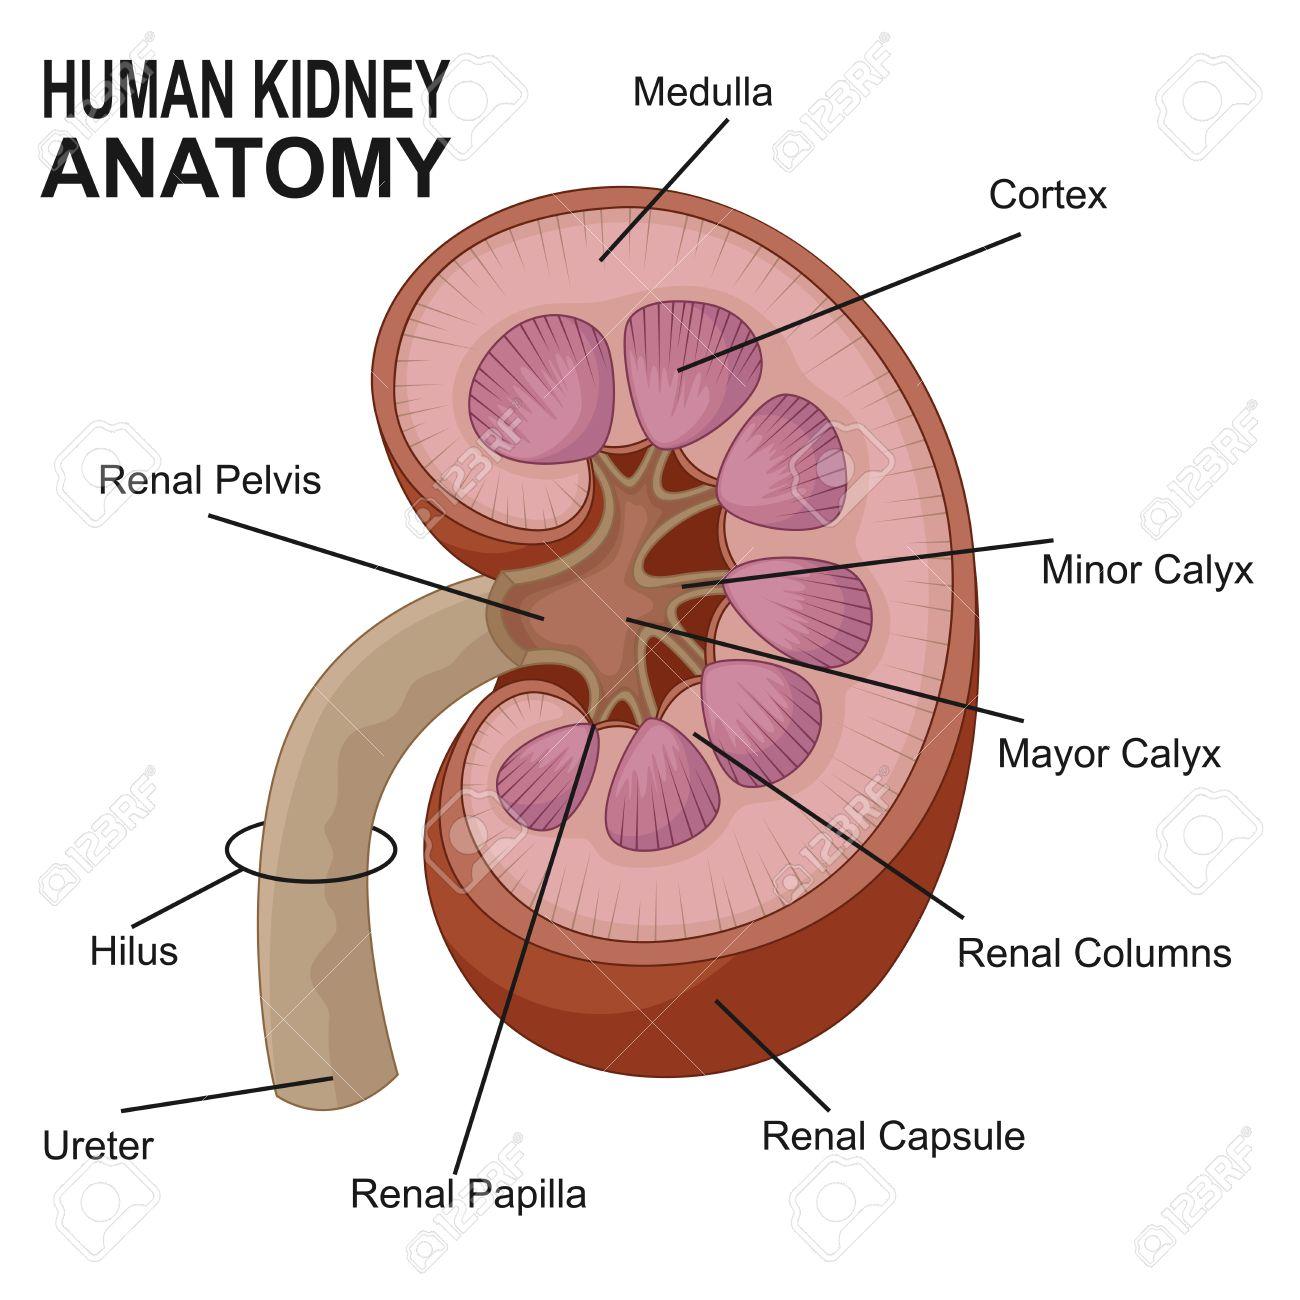 Human Kidney Anatomy Cartoon Royalty Free Cliparts, Vectors, And ...